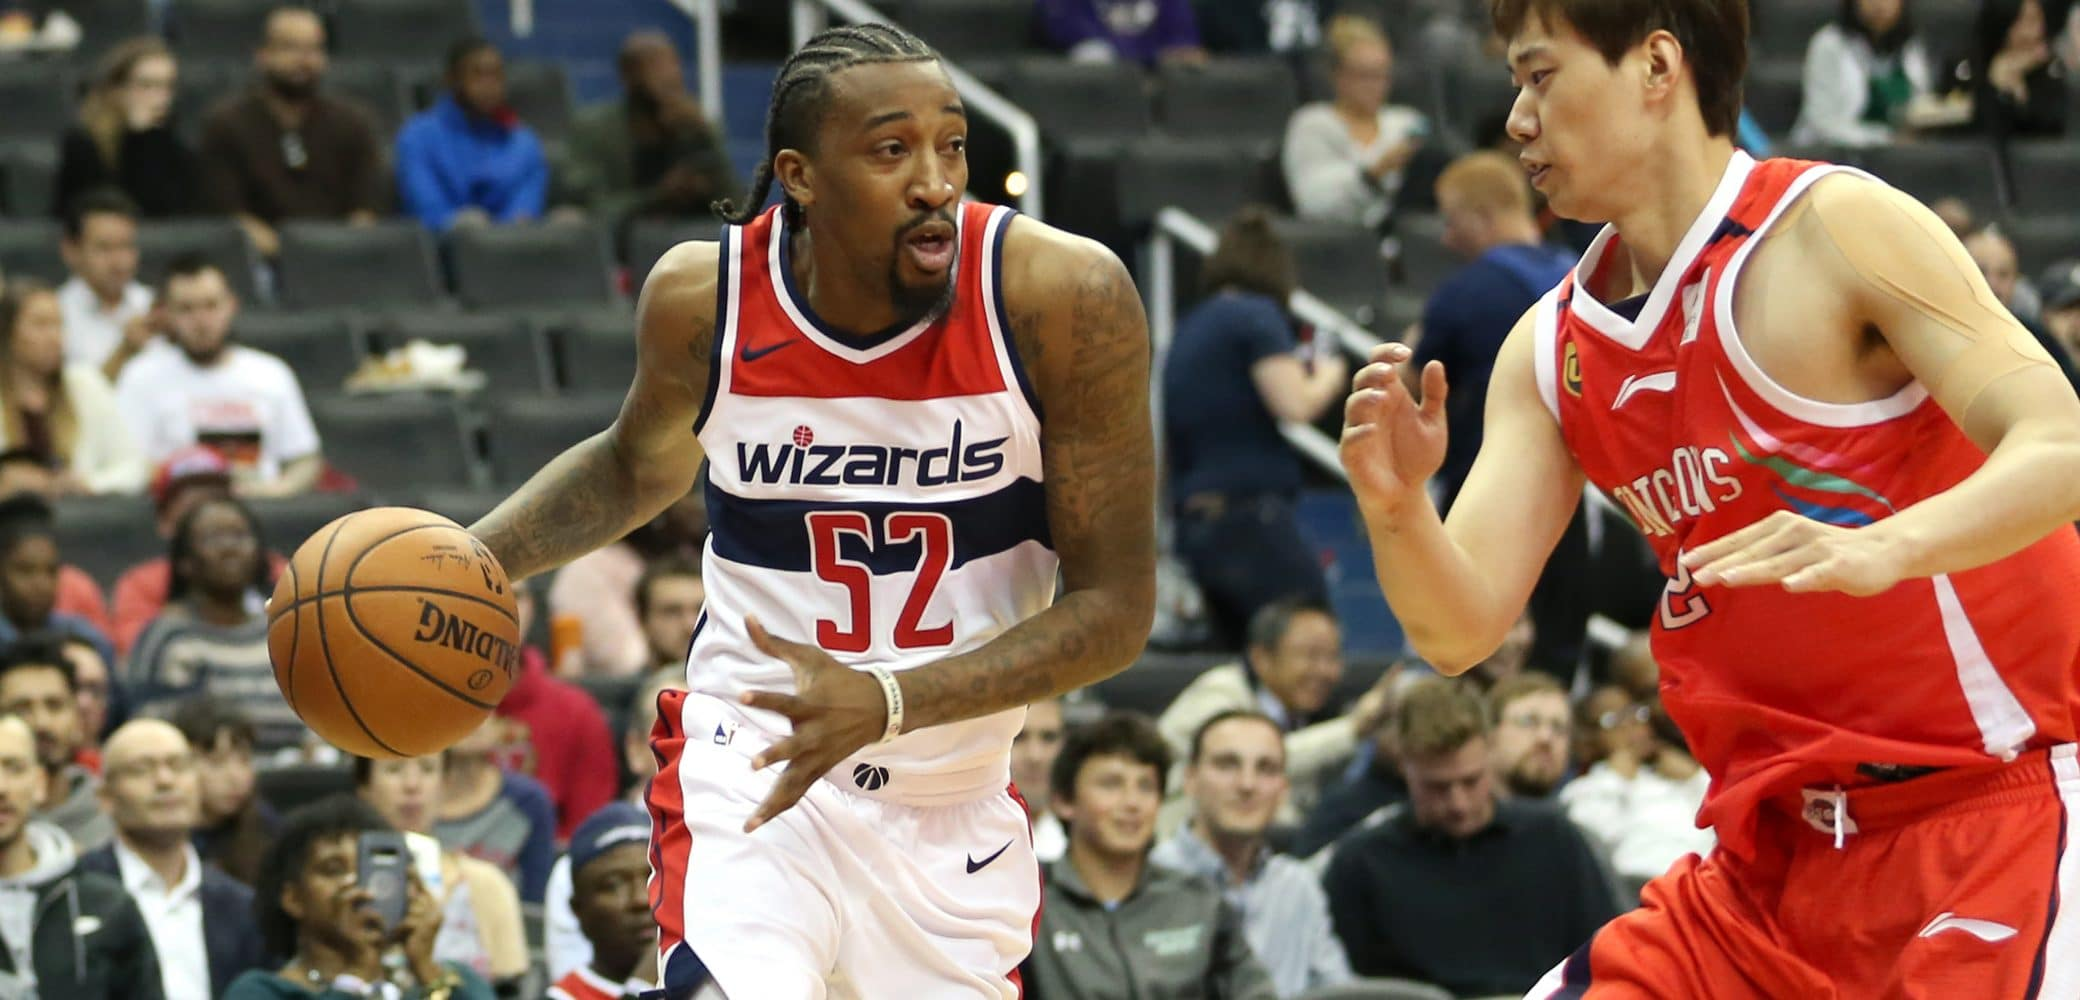 Jordan McRae of The Washington Wizards